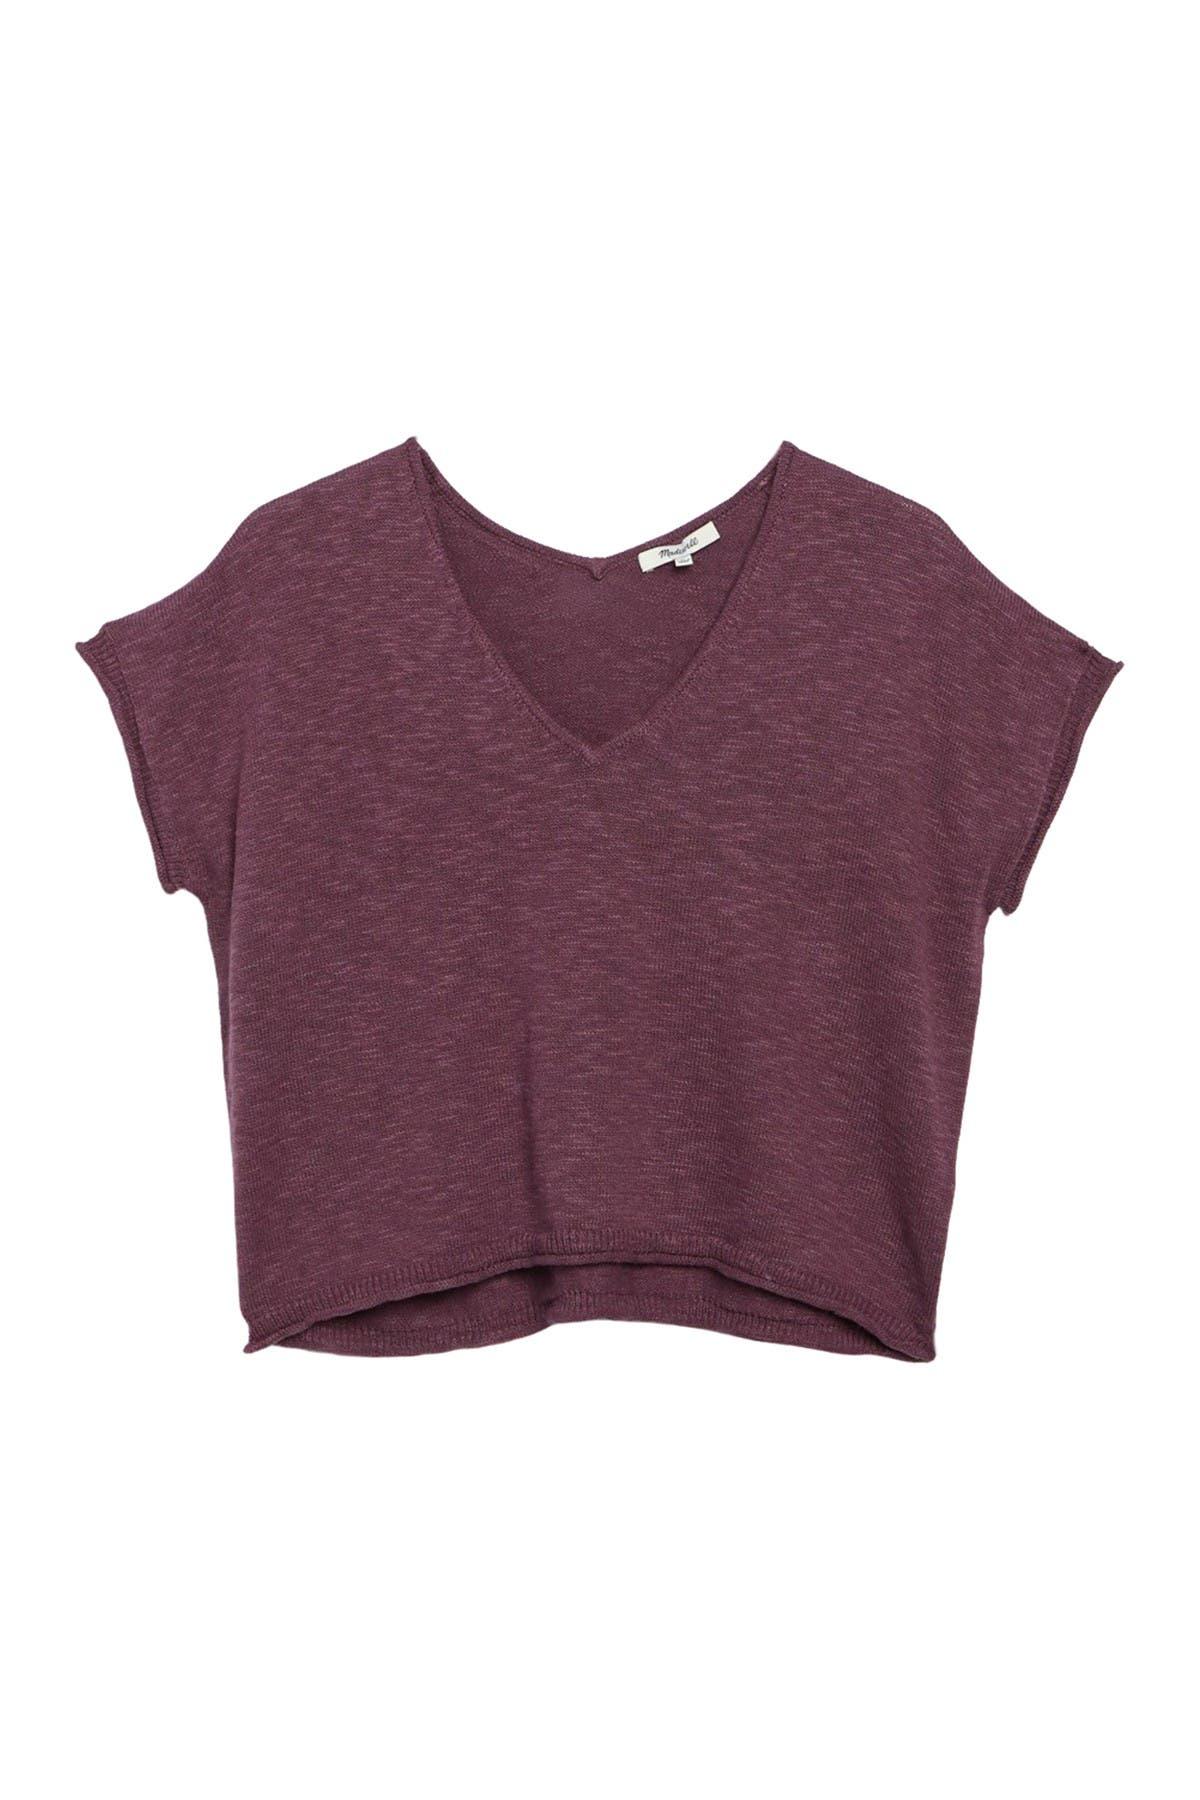 Image of Madewell Ellendale Marled Short Sleeve Sweater Top